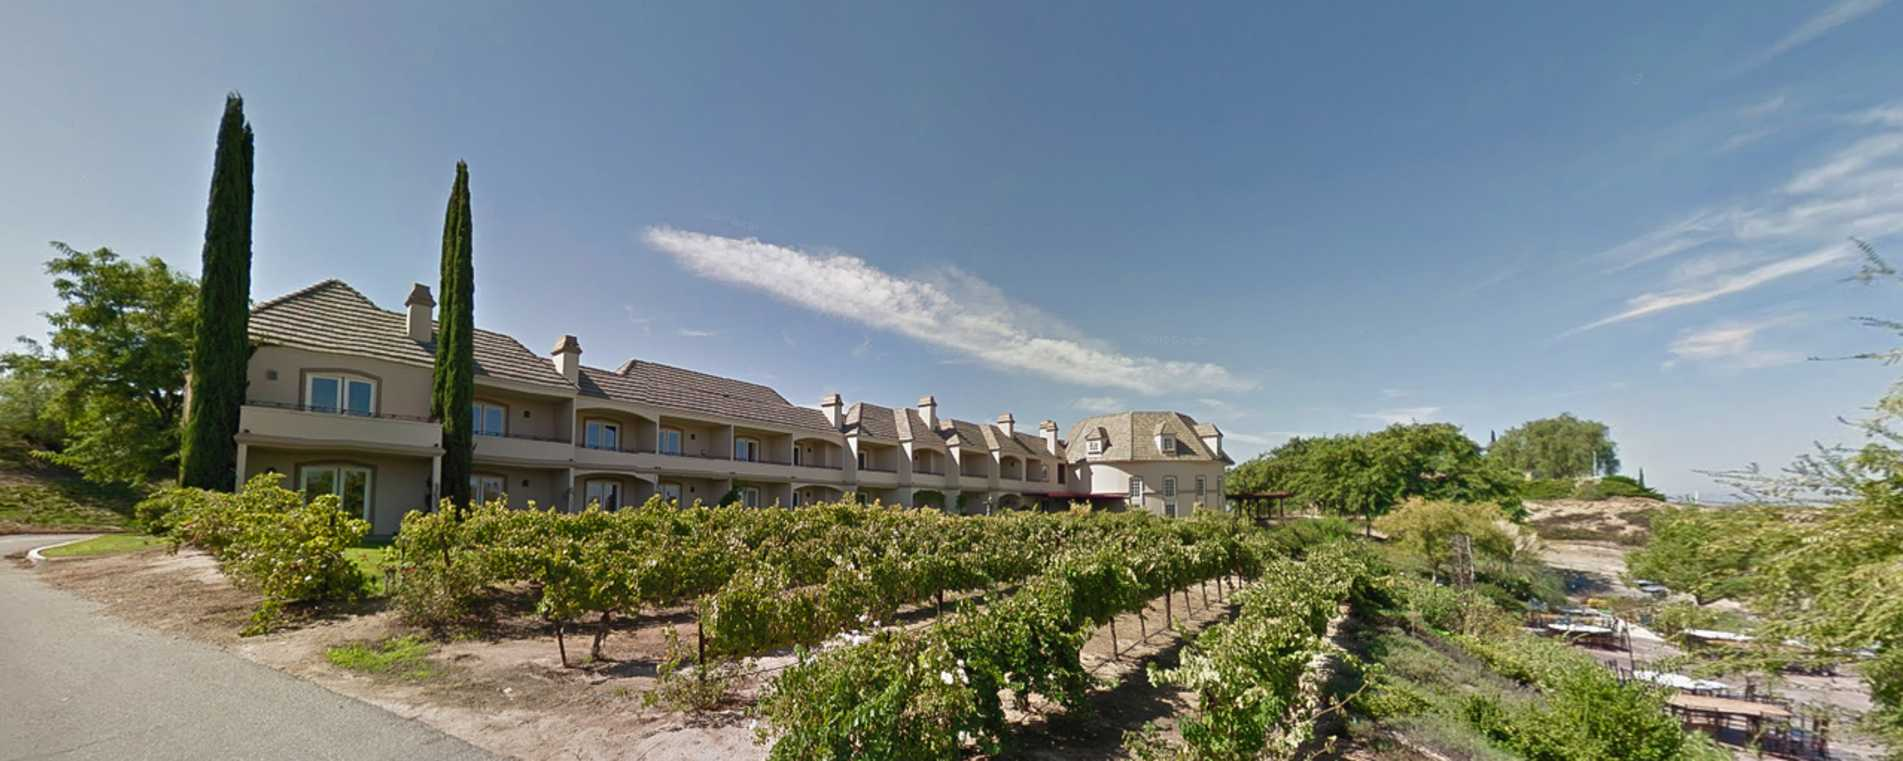 Inn at Churon Winery - Temecula